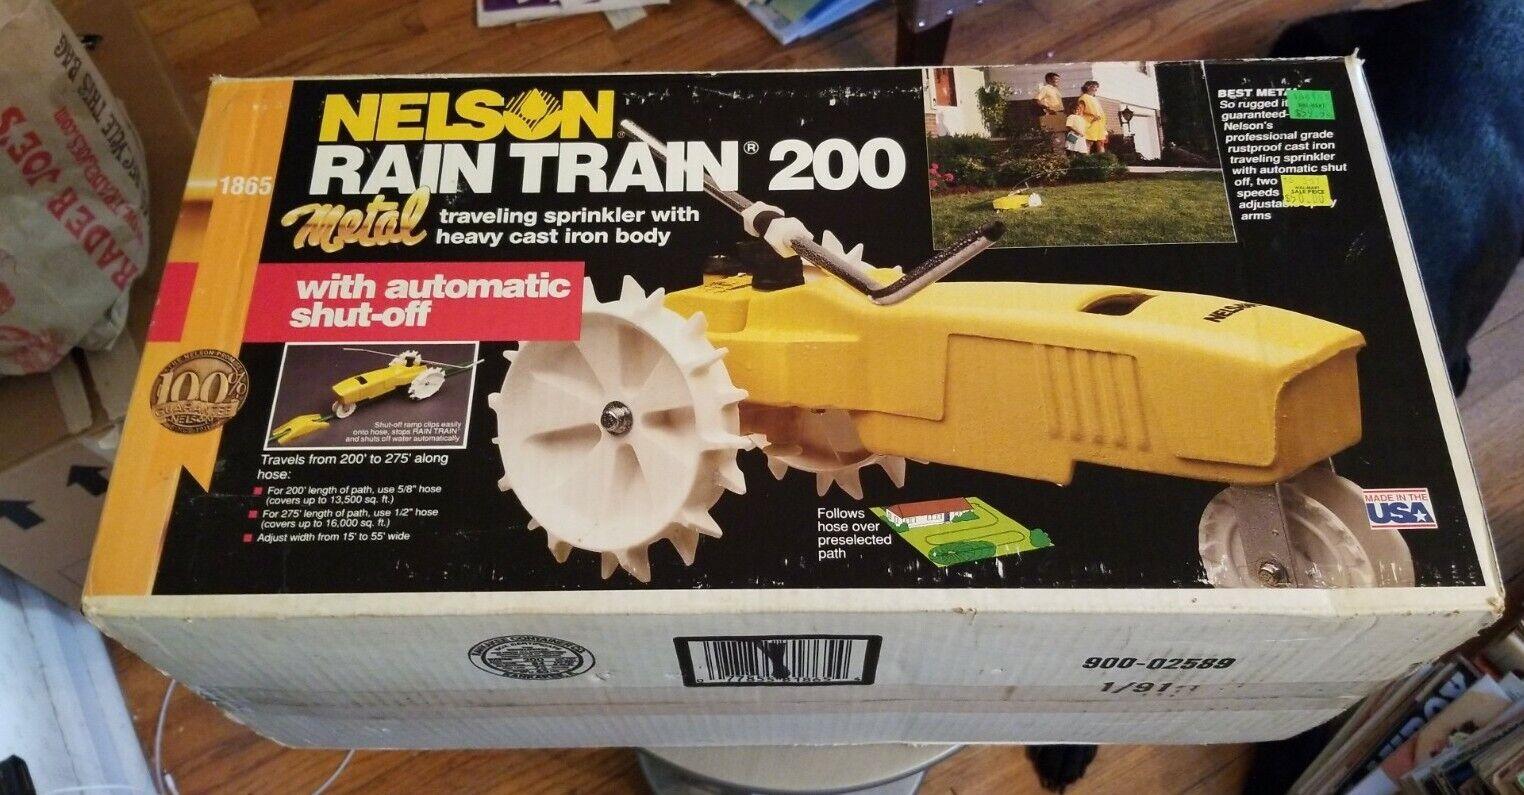 Nelson Rain Train 200 Metal Traveling Sprinkler Heavy Cast Iron Body Automatic